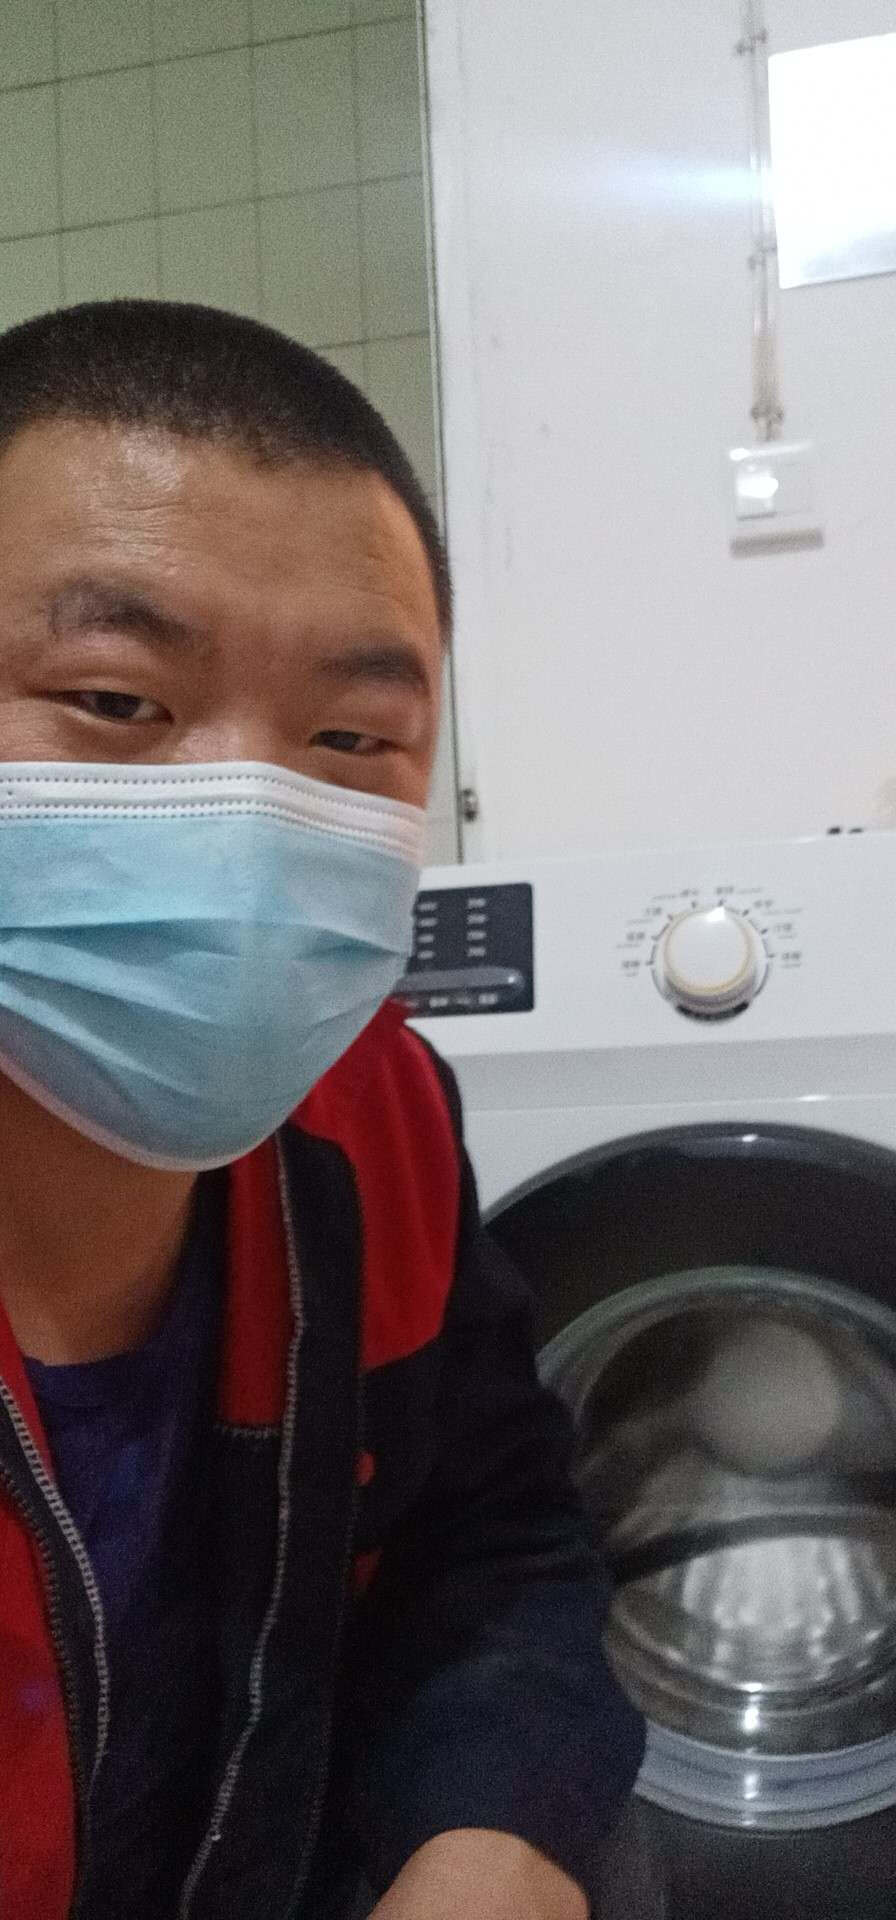 TCL滚筒洗衣机全自动8公斤变频节能高温煮洗杀菌中途添衣P300系列(芭蕾白)芭蕾白